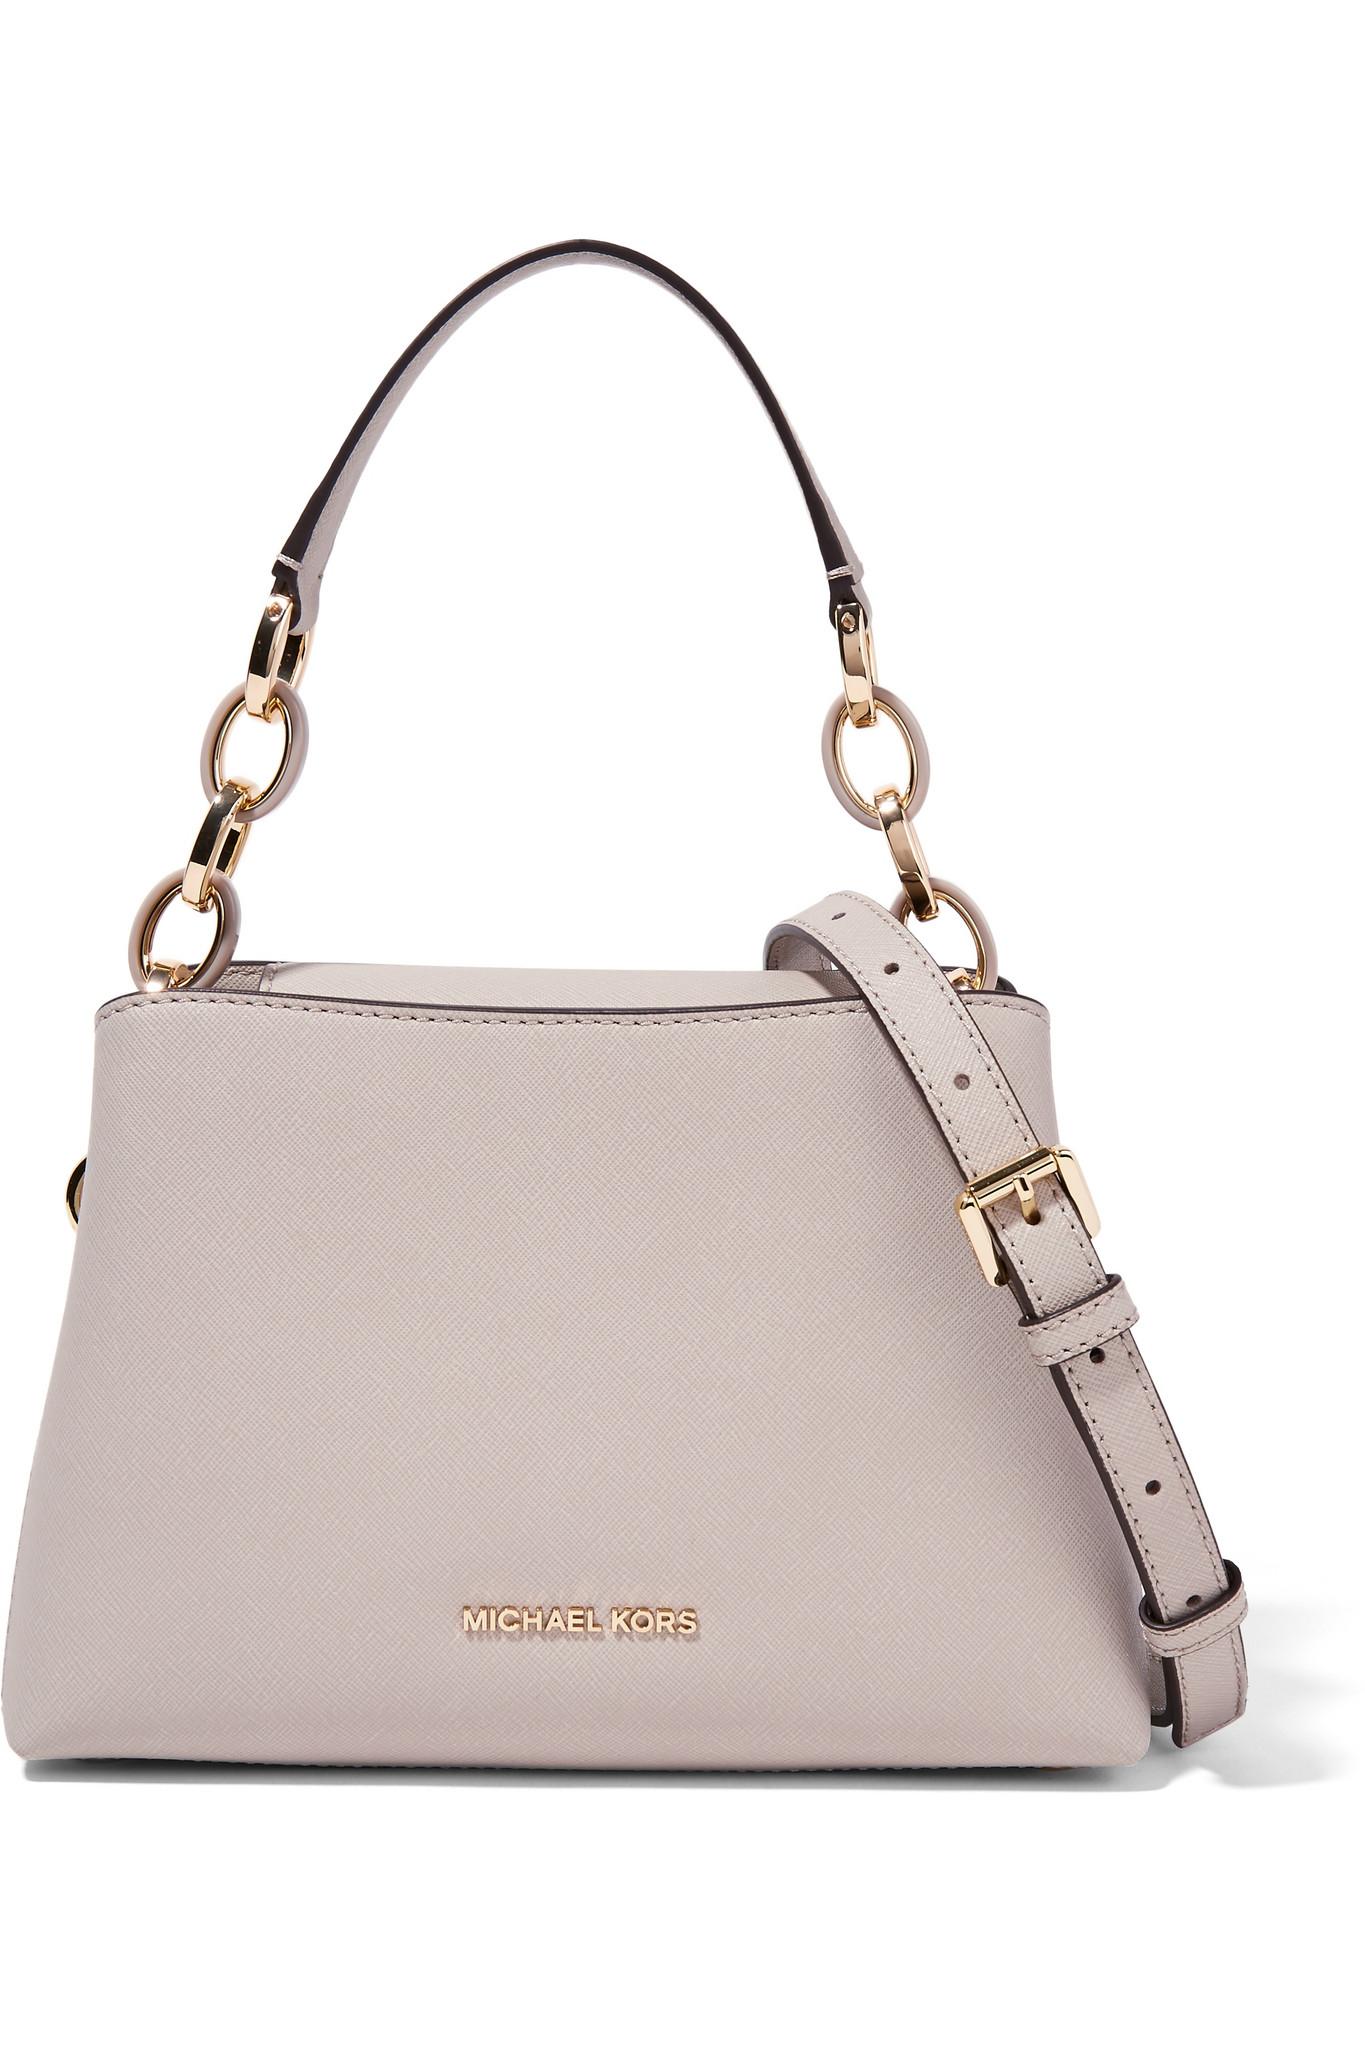 c9674b58f0cd MICHAEL Michael Kors Portia Small Textured-leather Shoulder Bag in ...